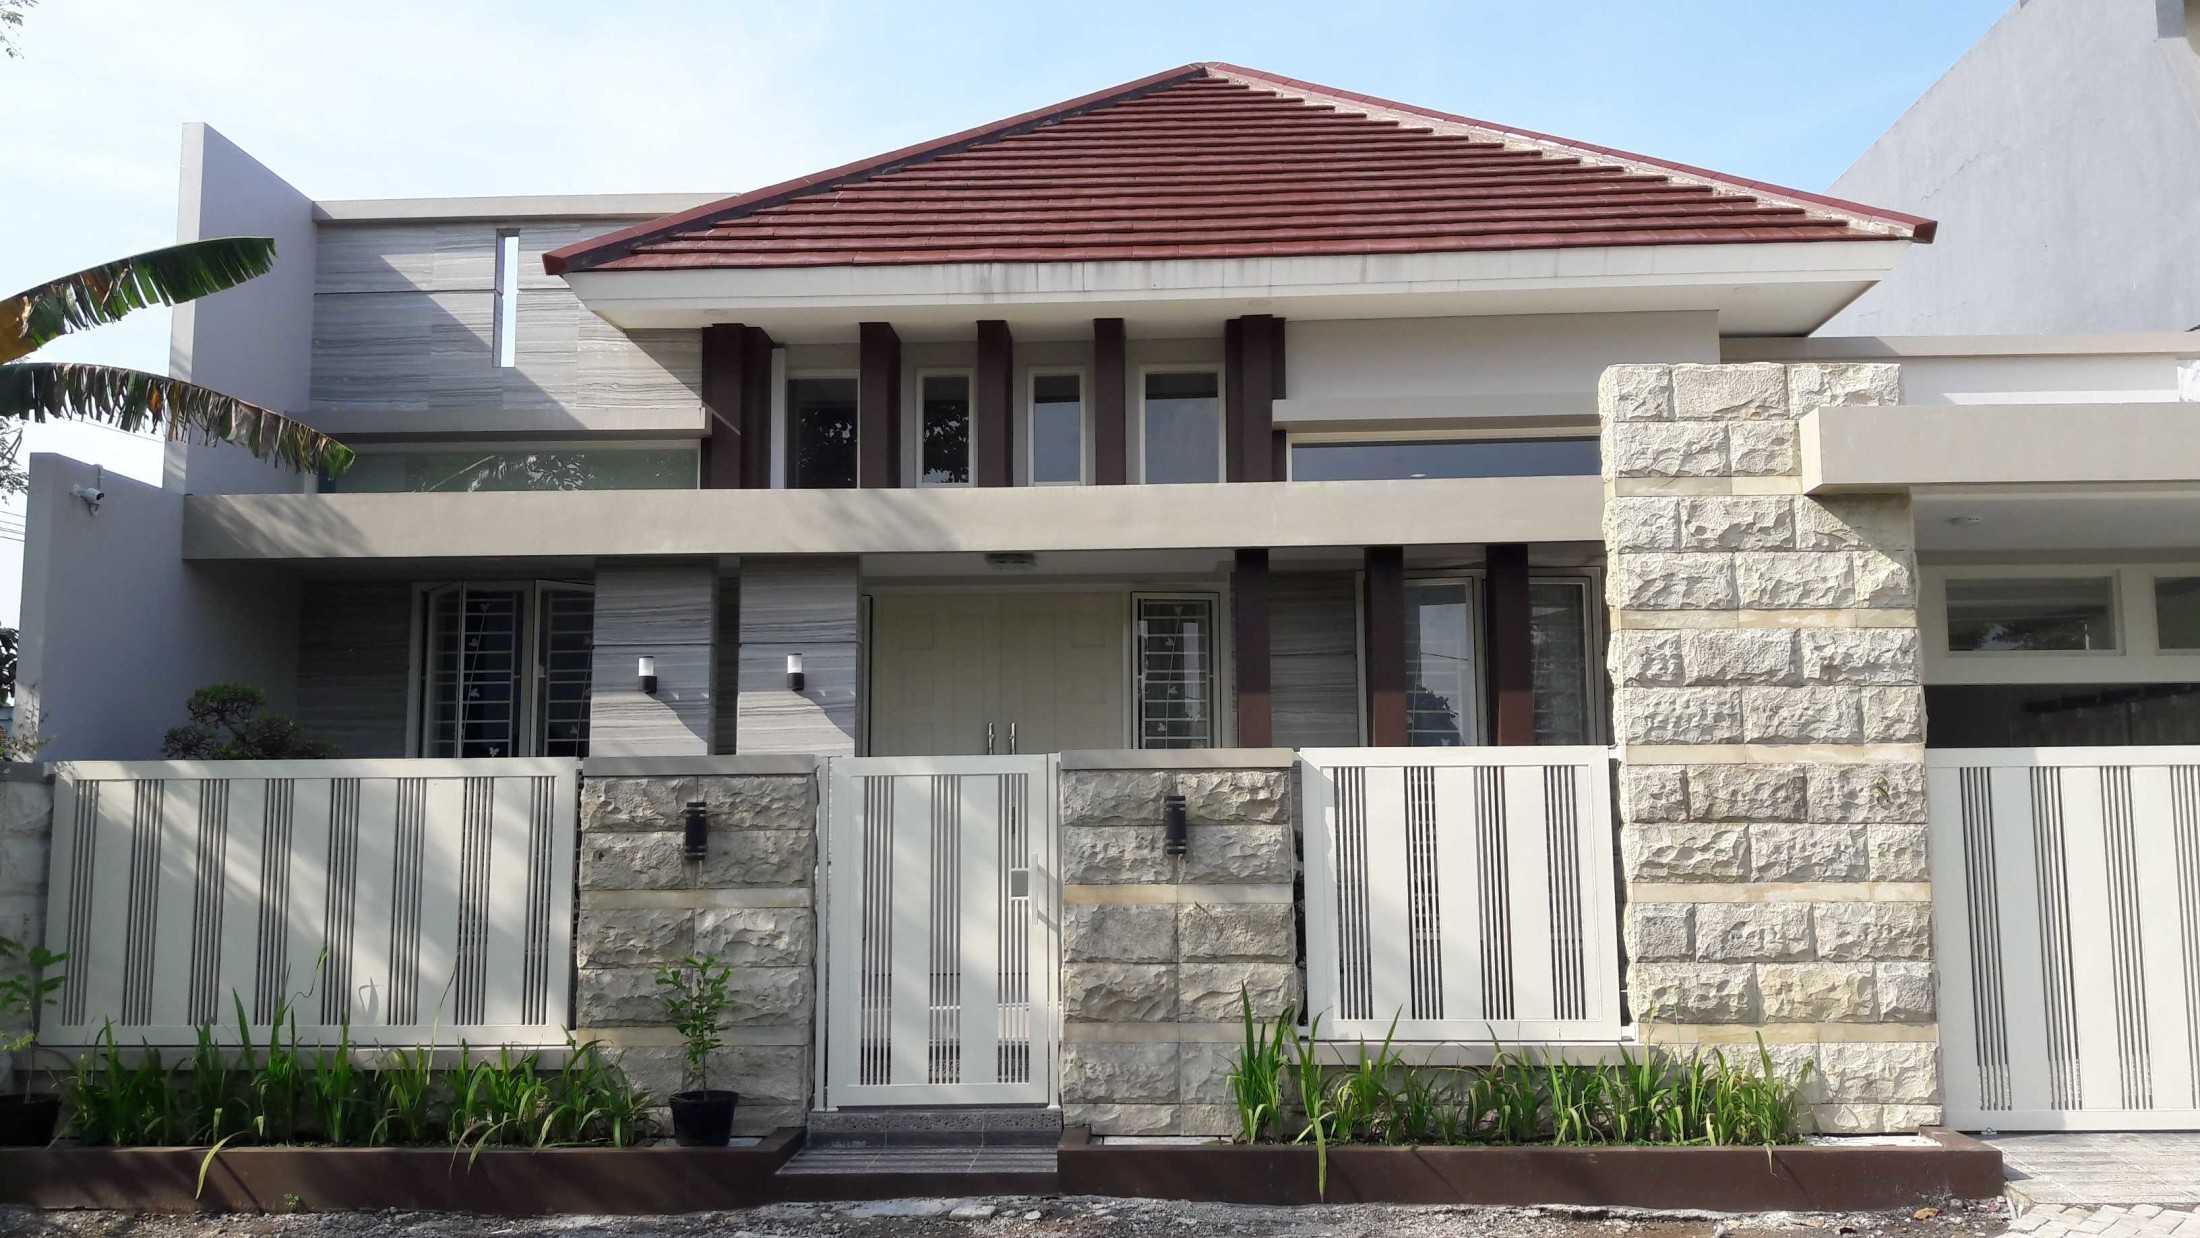 Gradasi Sam House Surabaya, Kota Sby, Jawa Timur, Indonesia Surabaya, Kota Sby, Jawa Timur, Indonesia Gradasi7-Rumah-Bpk-Sam  88993